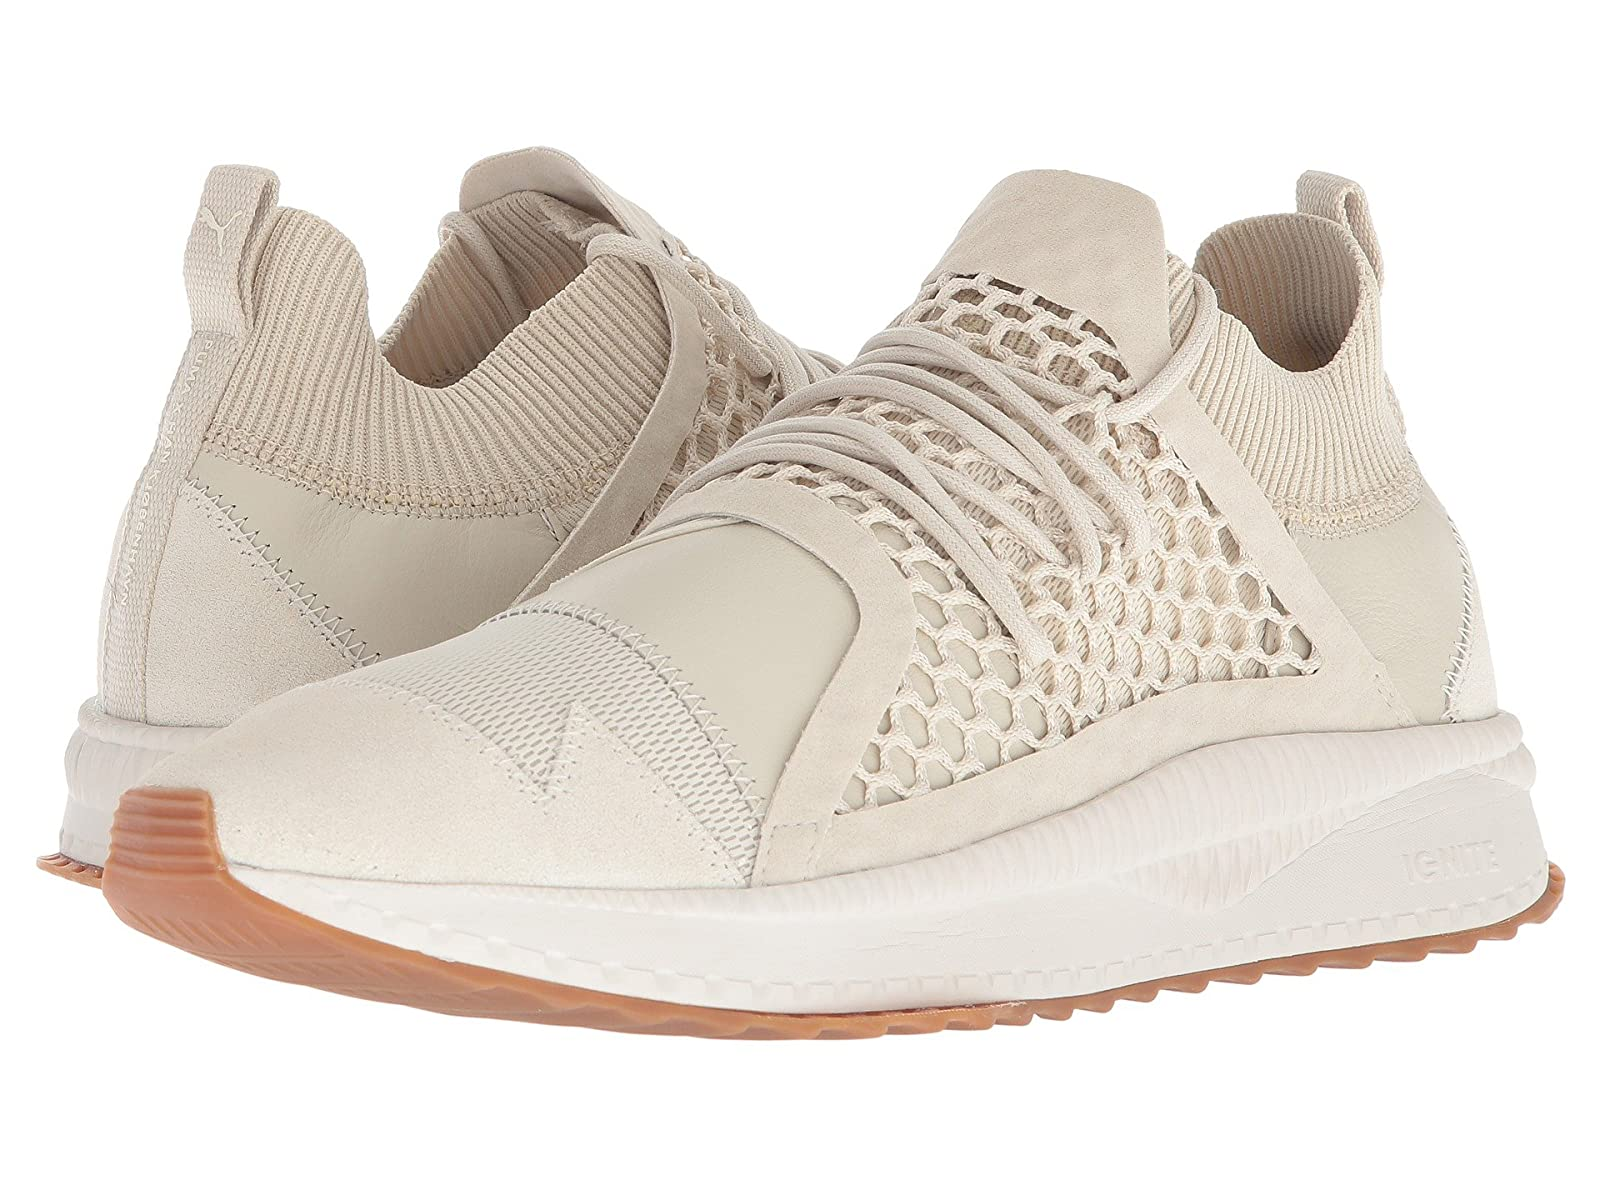 PUMA Puma x Han KJØBENHAVN TSUGI Netfit SneakerAtmospheric grades have affordable shoes